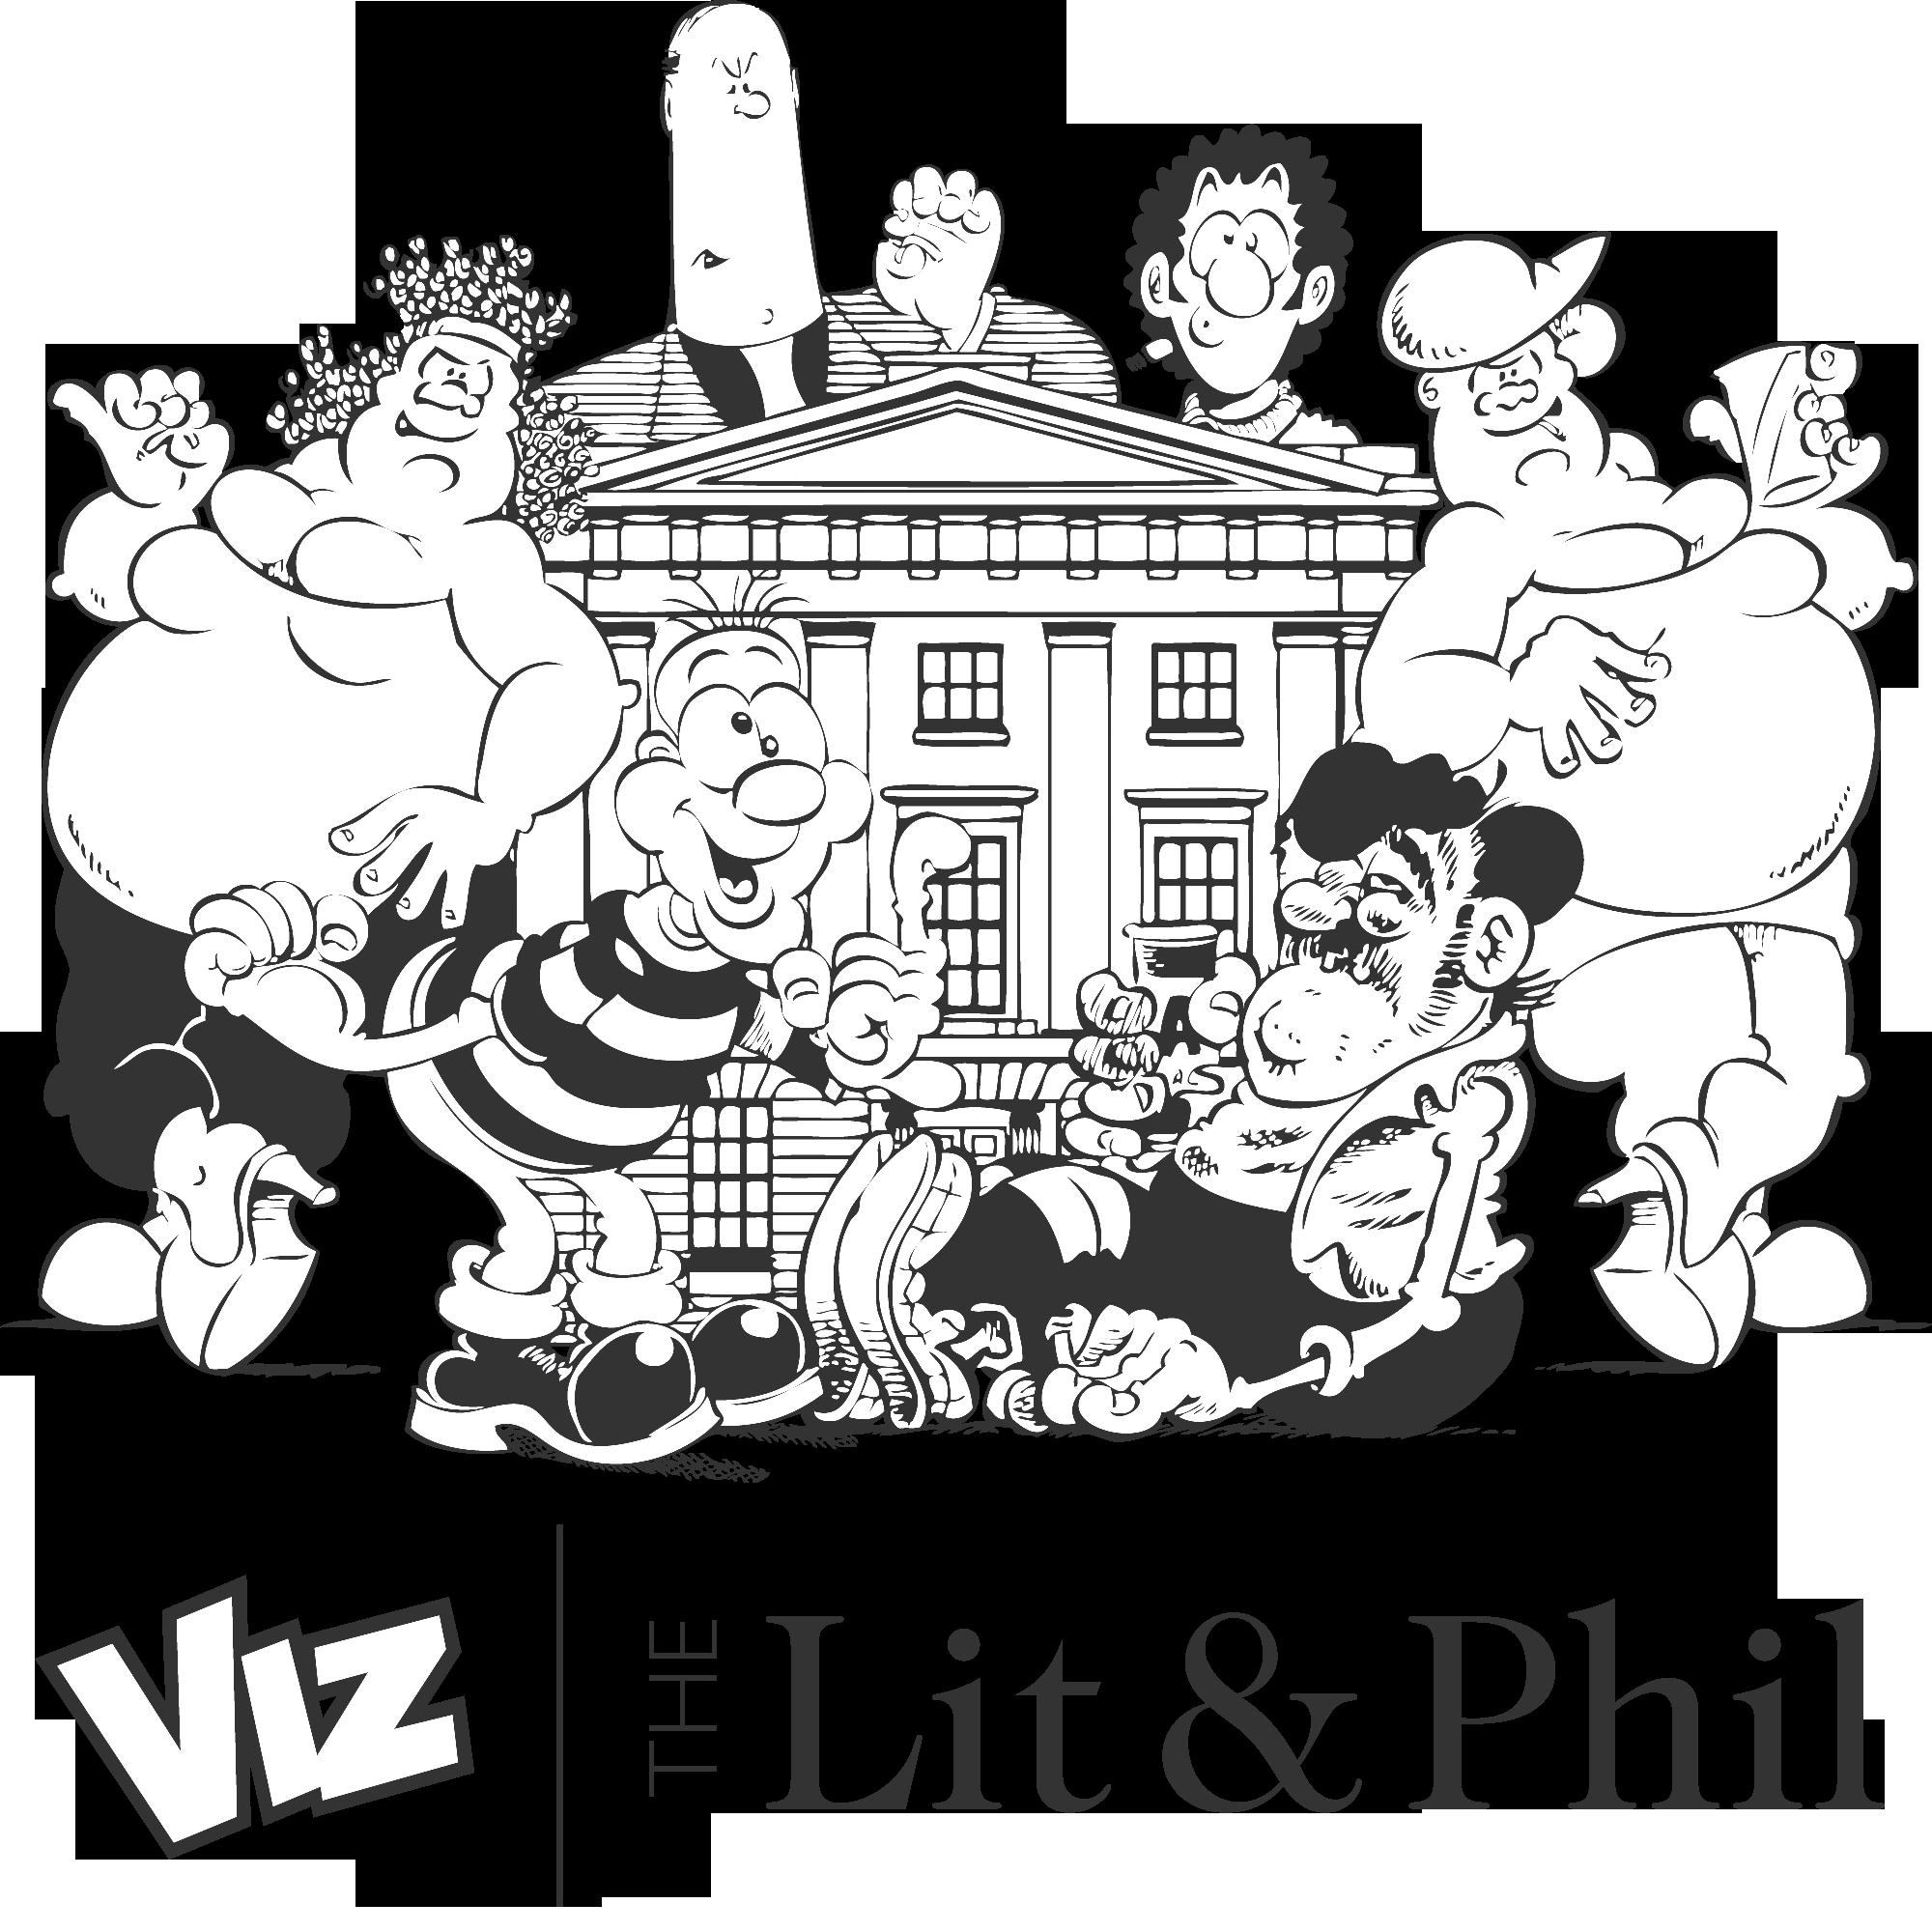 Viz Comic, 2010